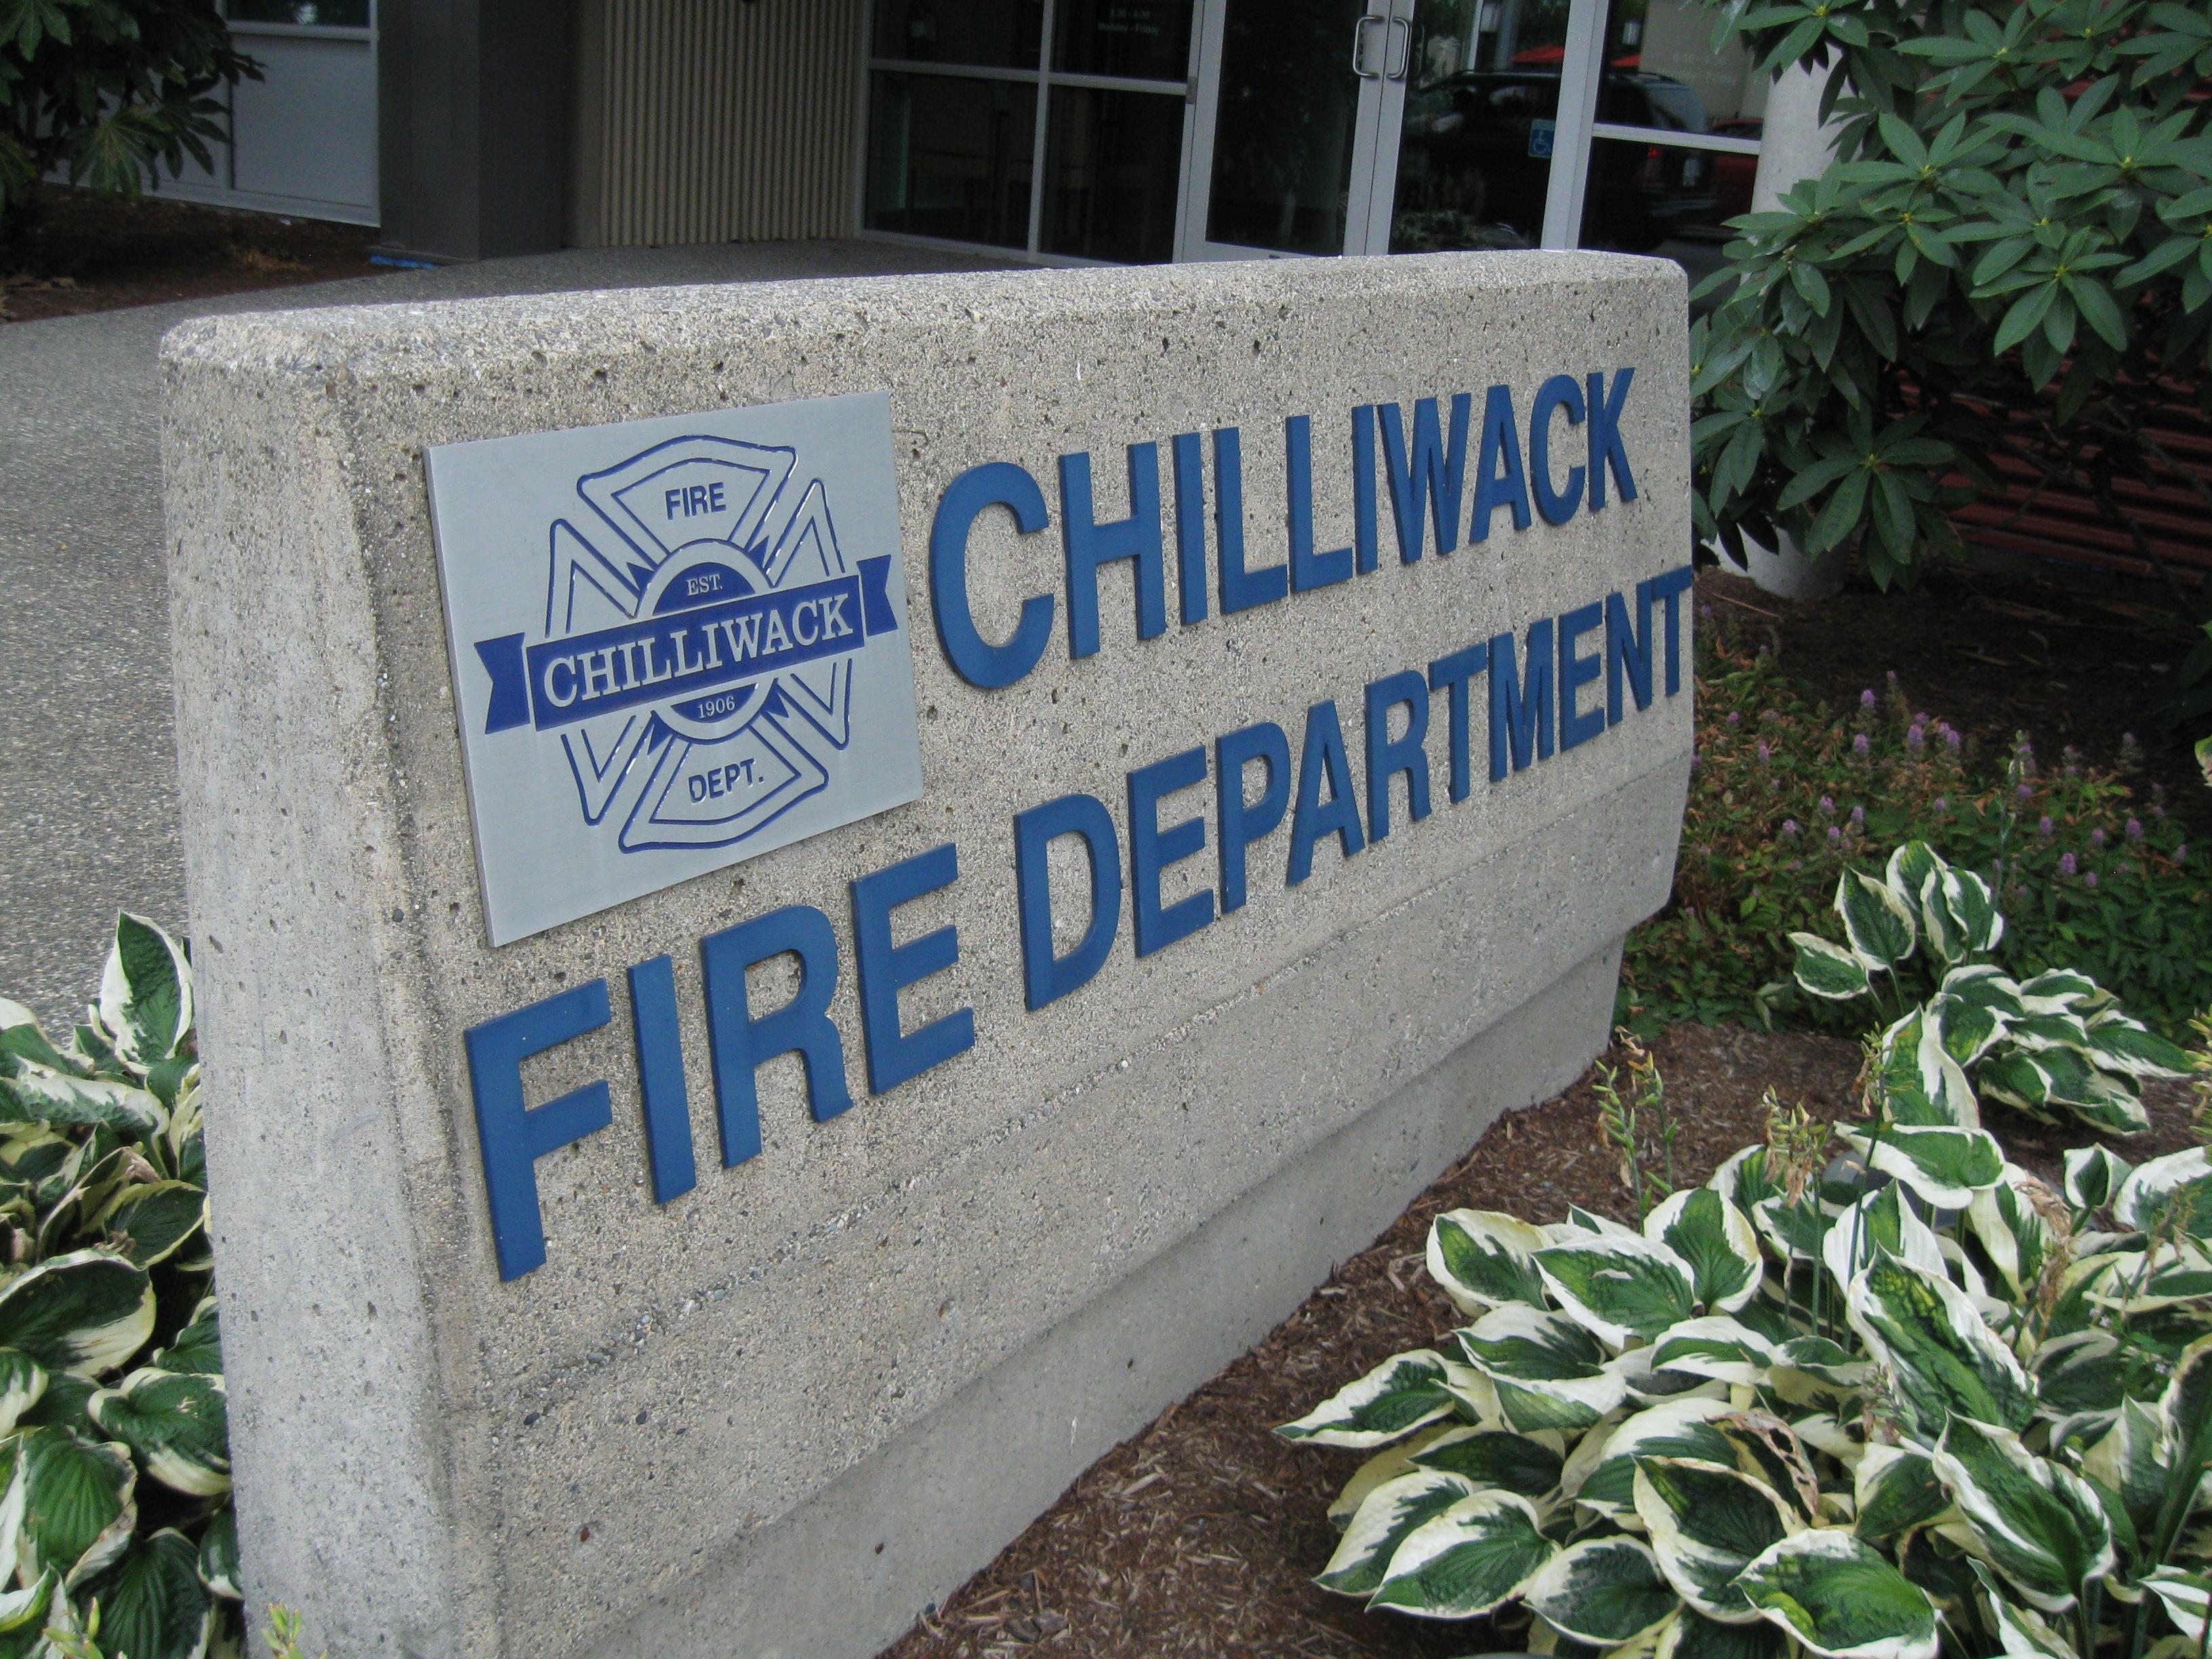 STK_Chilliwack Fire C